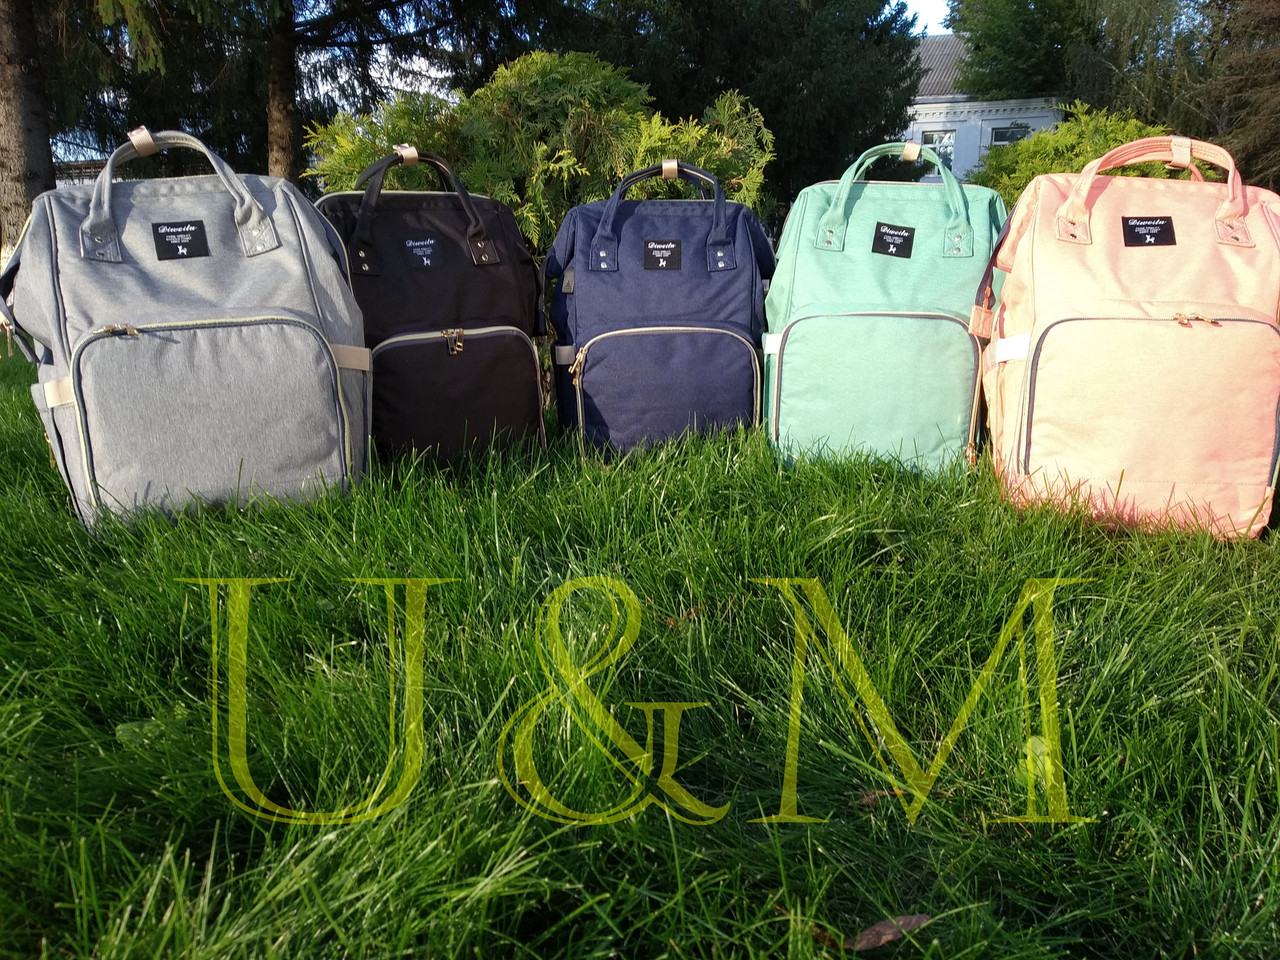 03f034c0f2ac Сумка рюкзак для мам с USB, рюкзак для мам, Рюкзак-органайзер для мам